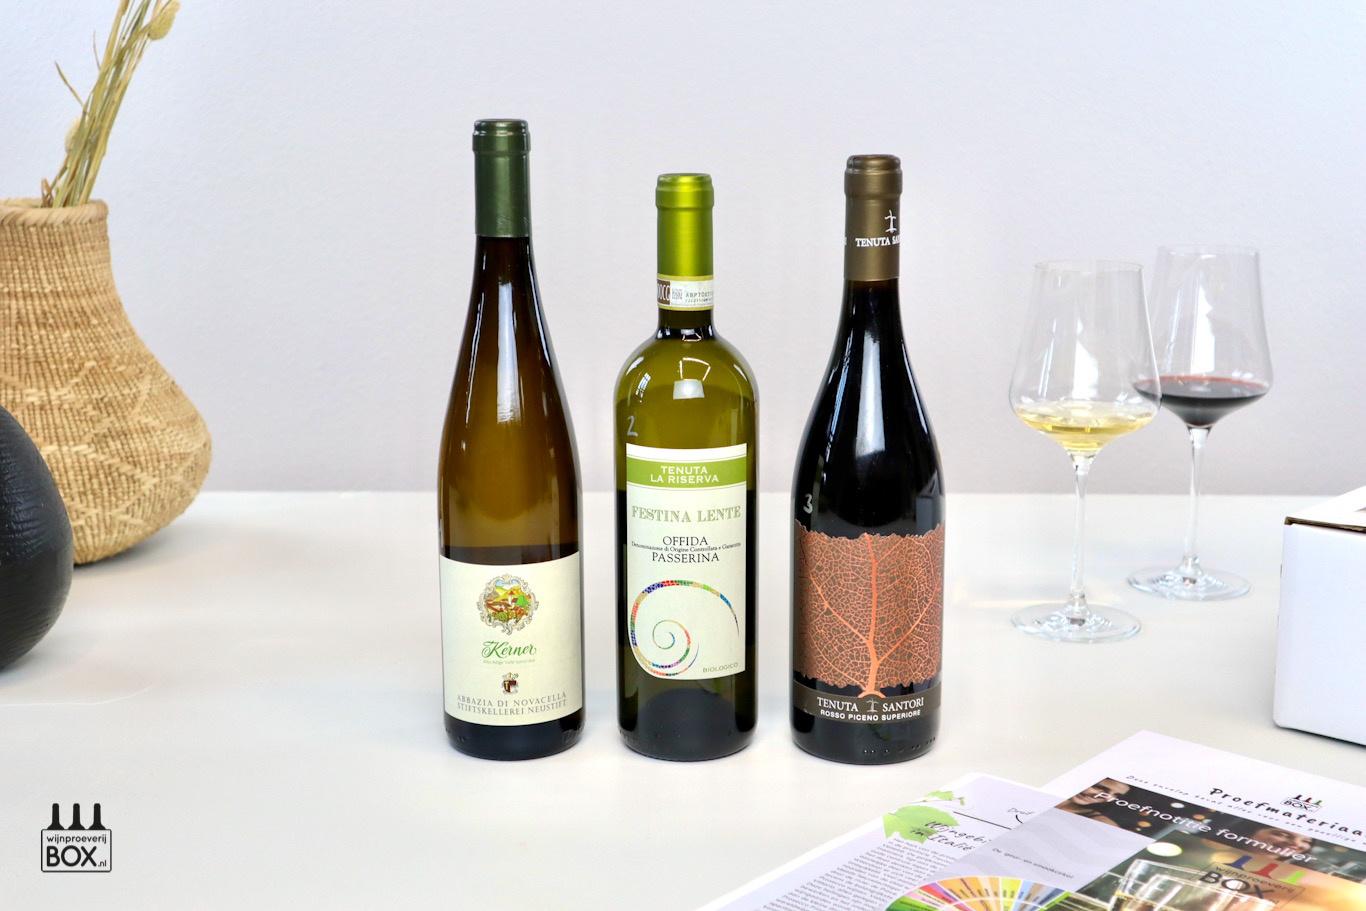 Wijnproeverijbox Wijntrip Verrassend Italië